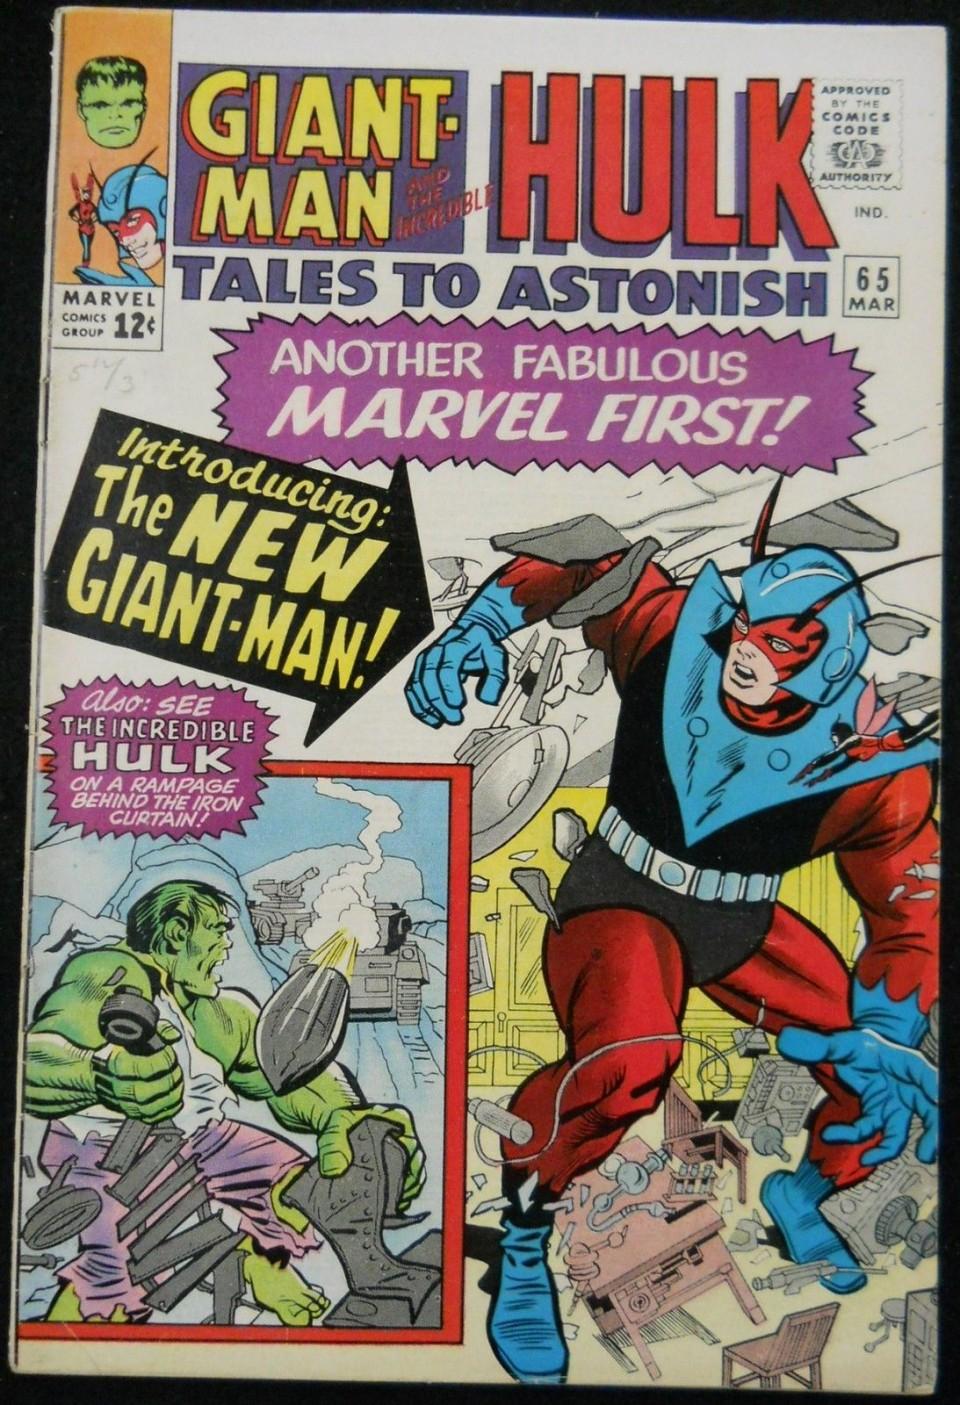 TALES TO ASTONISH #65 FN+NEW GIANT MAN COSTUME & TALES TO ASTONISH #65 FN+NEW GIANT MAN COSTUME - Silver Age Comics